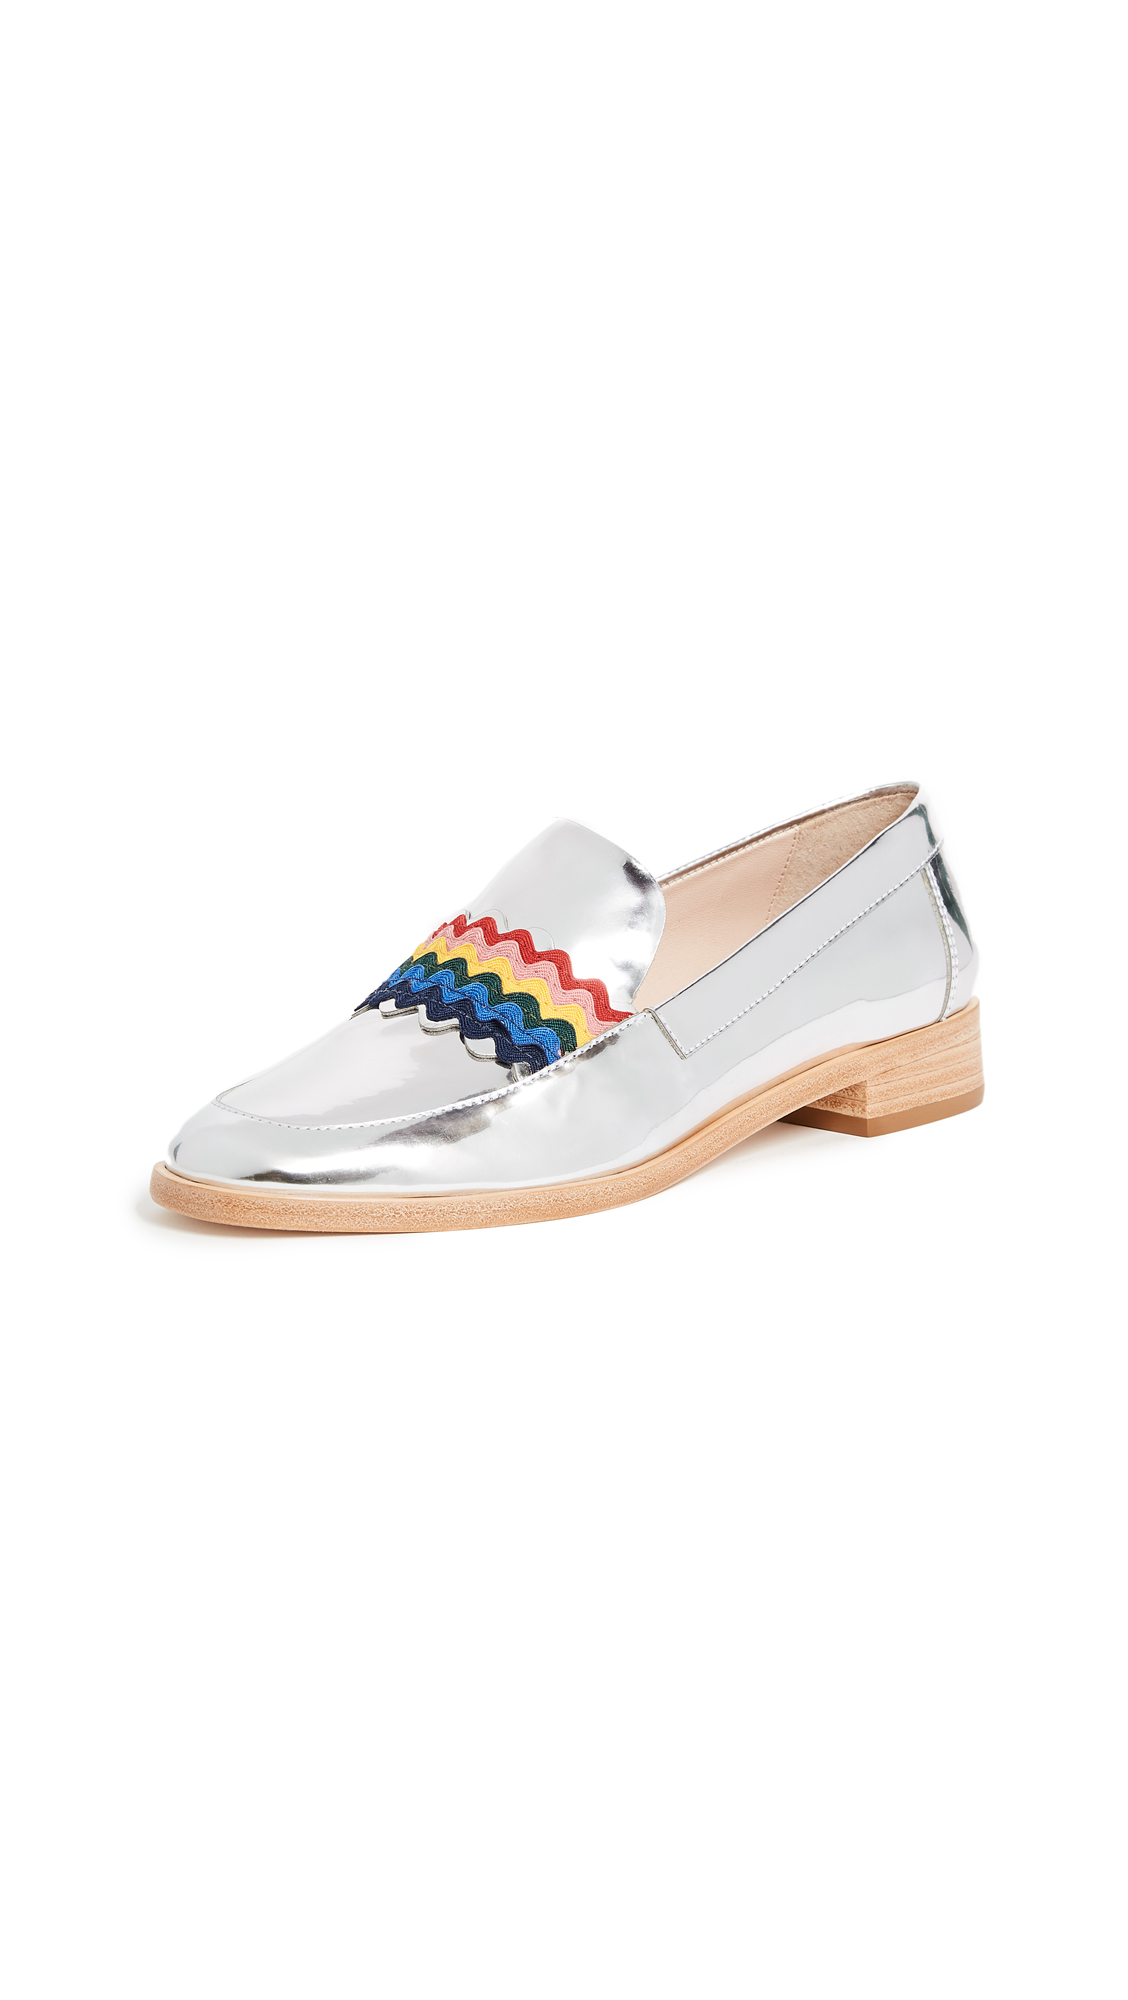 Loeffler Randall Greta Loafers - Silver/Rainbow